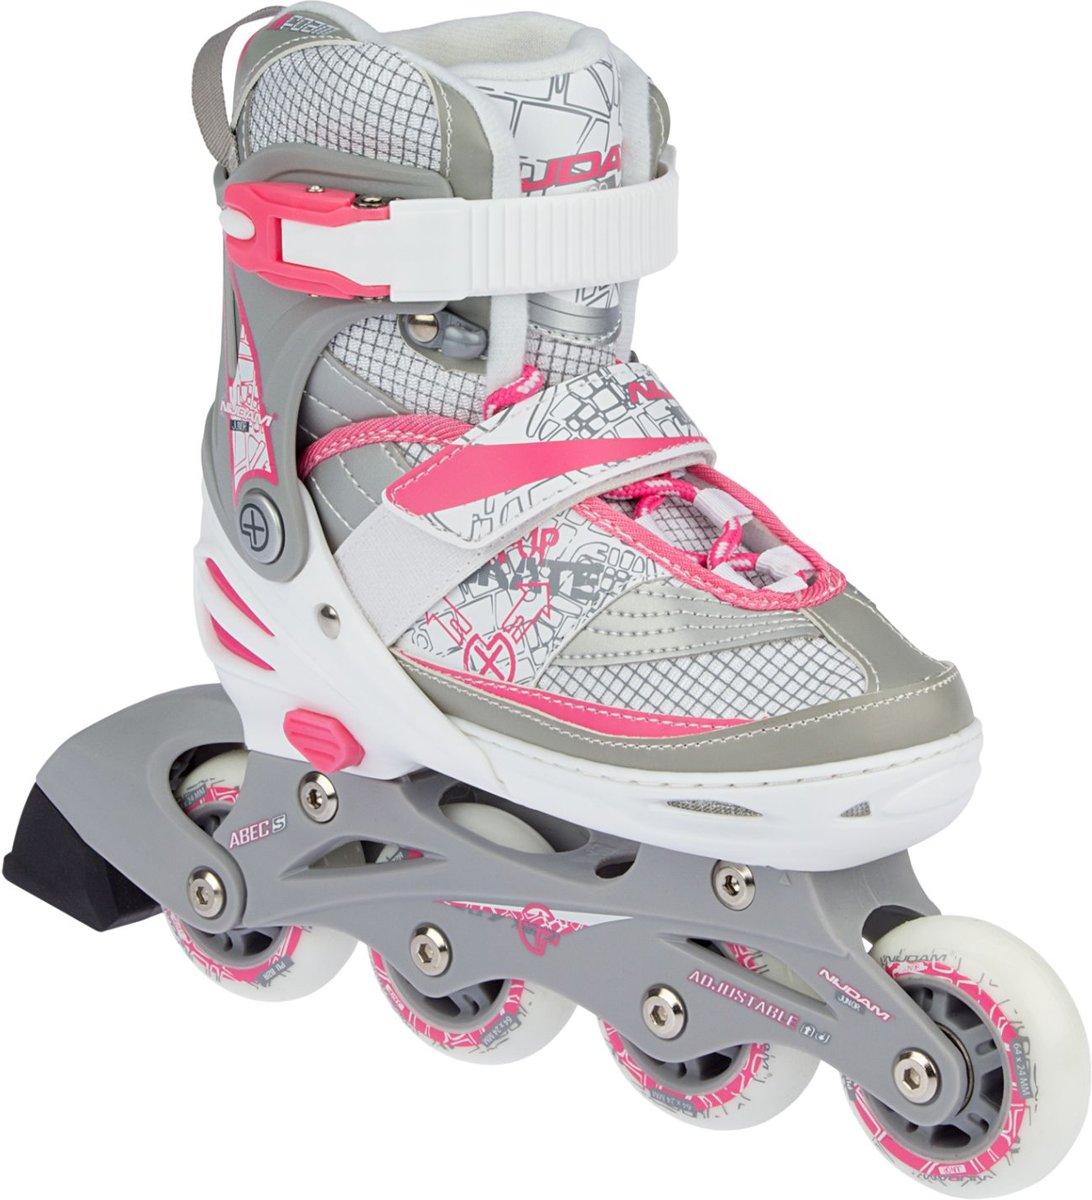 7cbc5af4a72 bol.com | Nijdam Junior Skate/Schaats Combo - Semi-Softboot - Wit - Maat  27-30